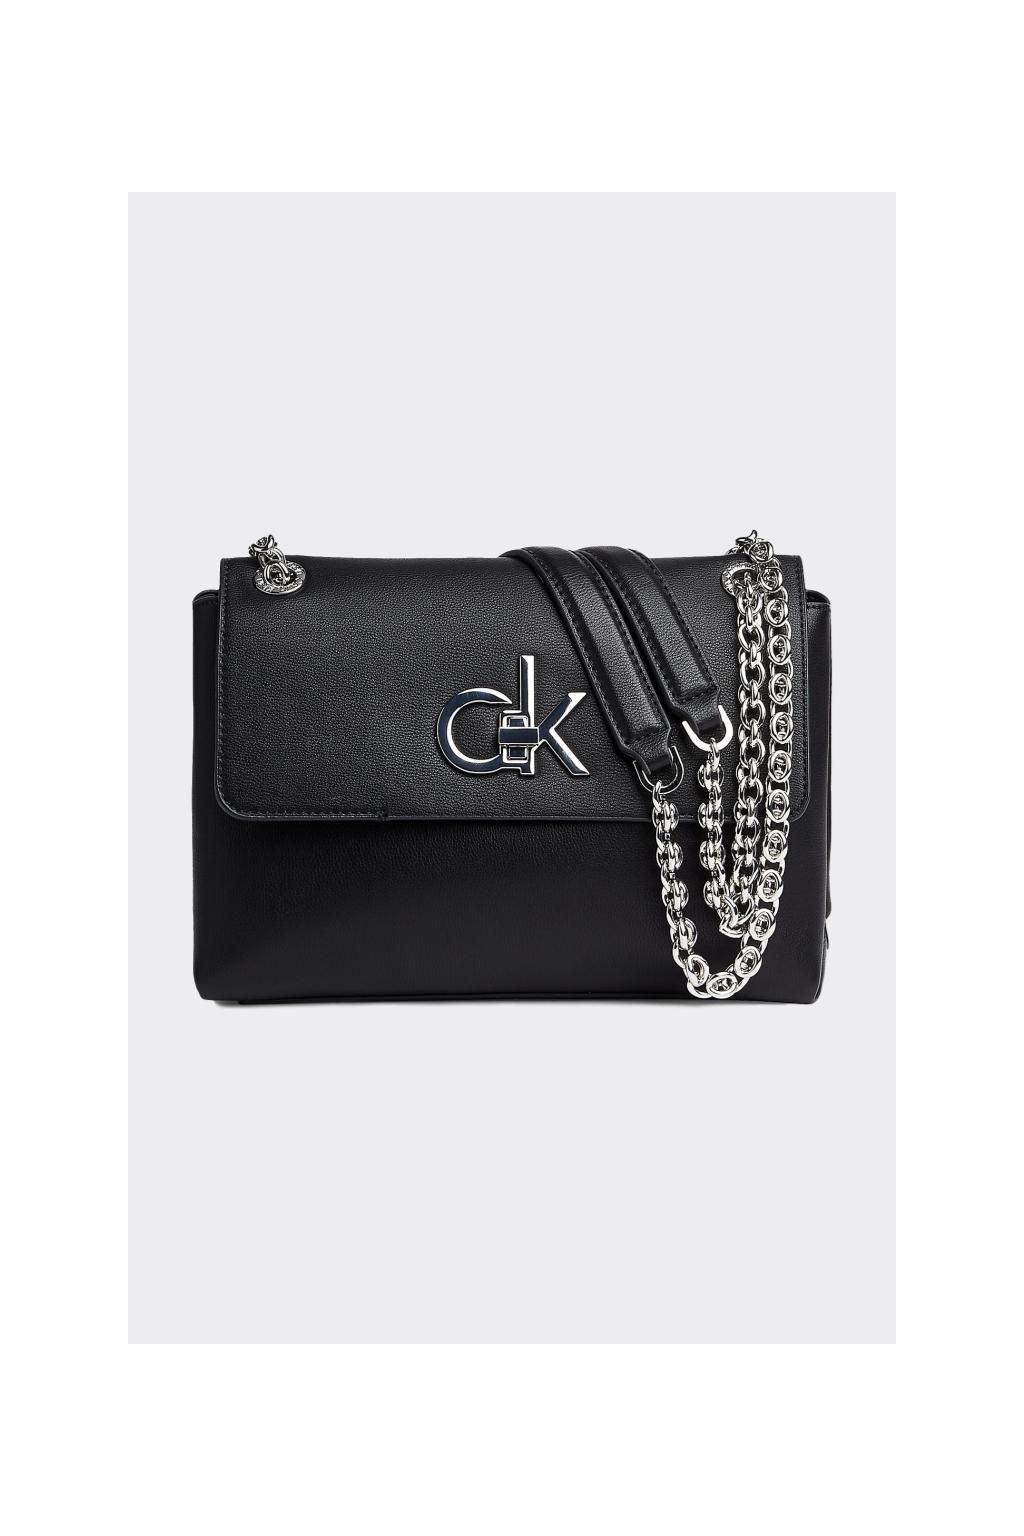 Calvin Klein crossbody kabelka - černá